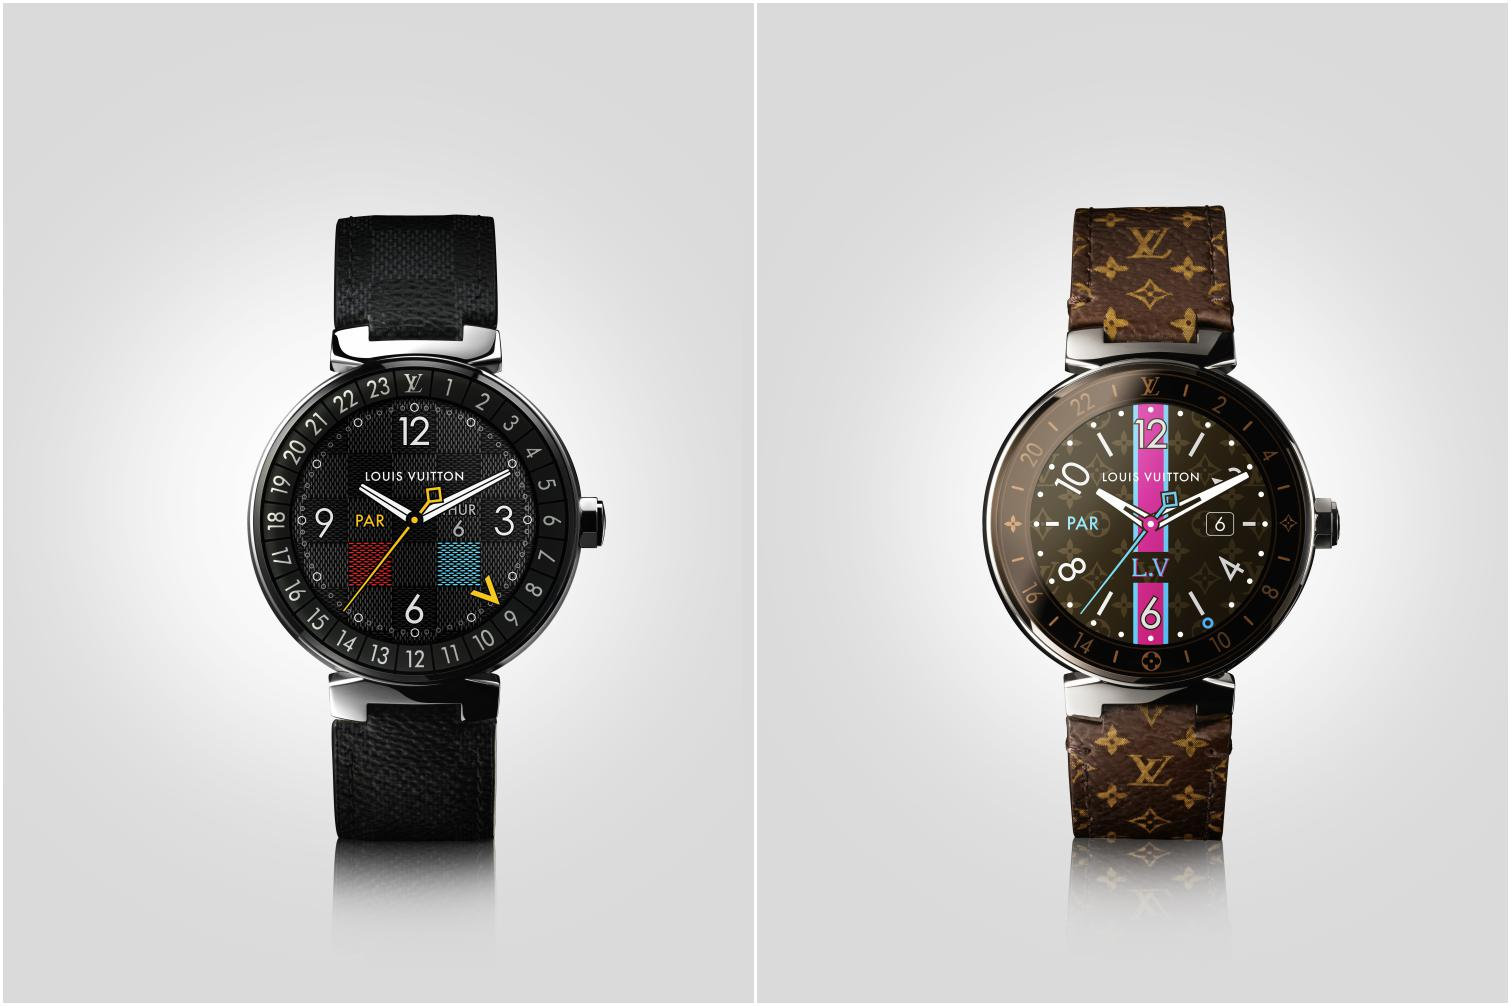 Louis Vuitton 进军智能腕表市场,合作方 Google 首次专为腕表定制操作系统